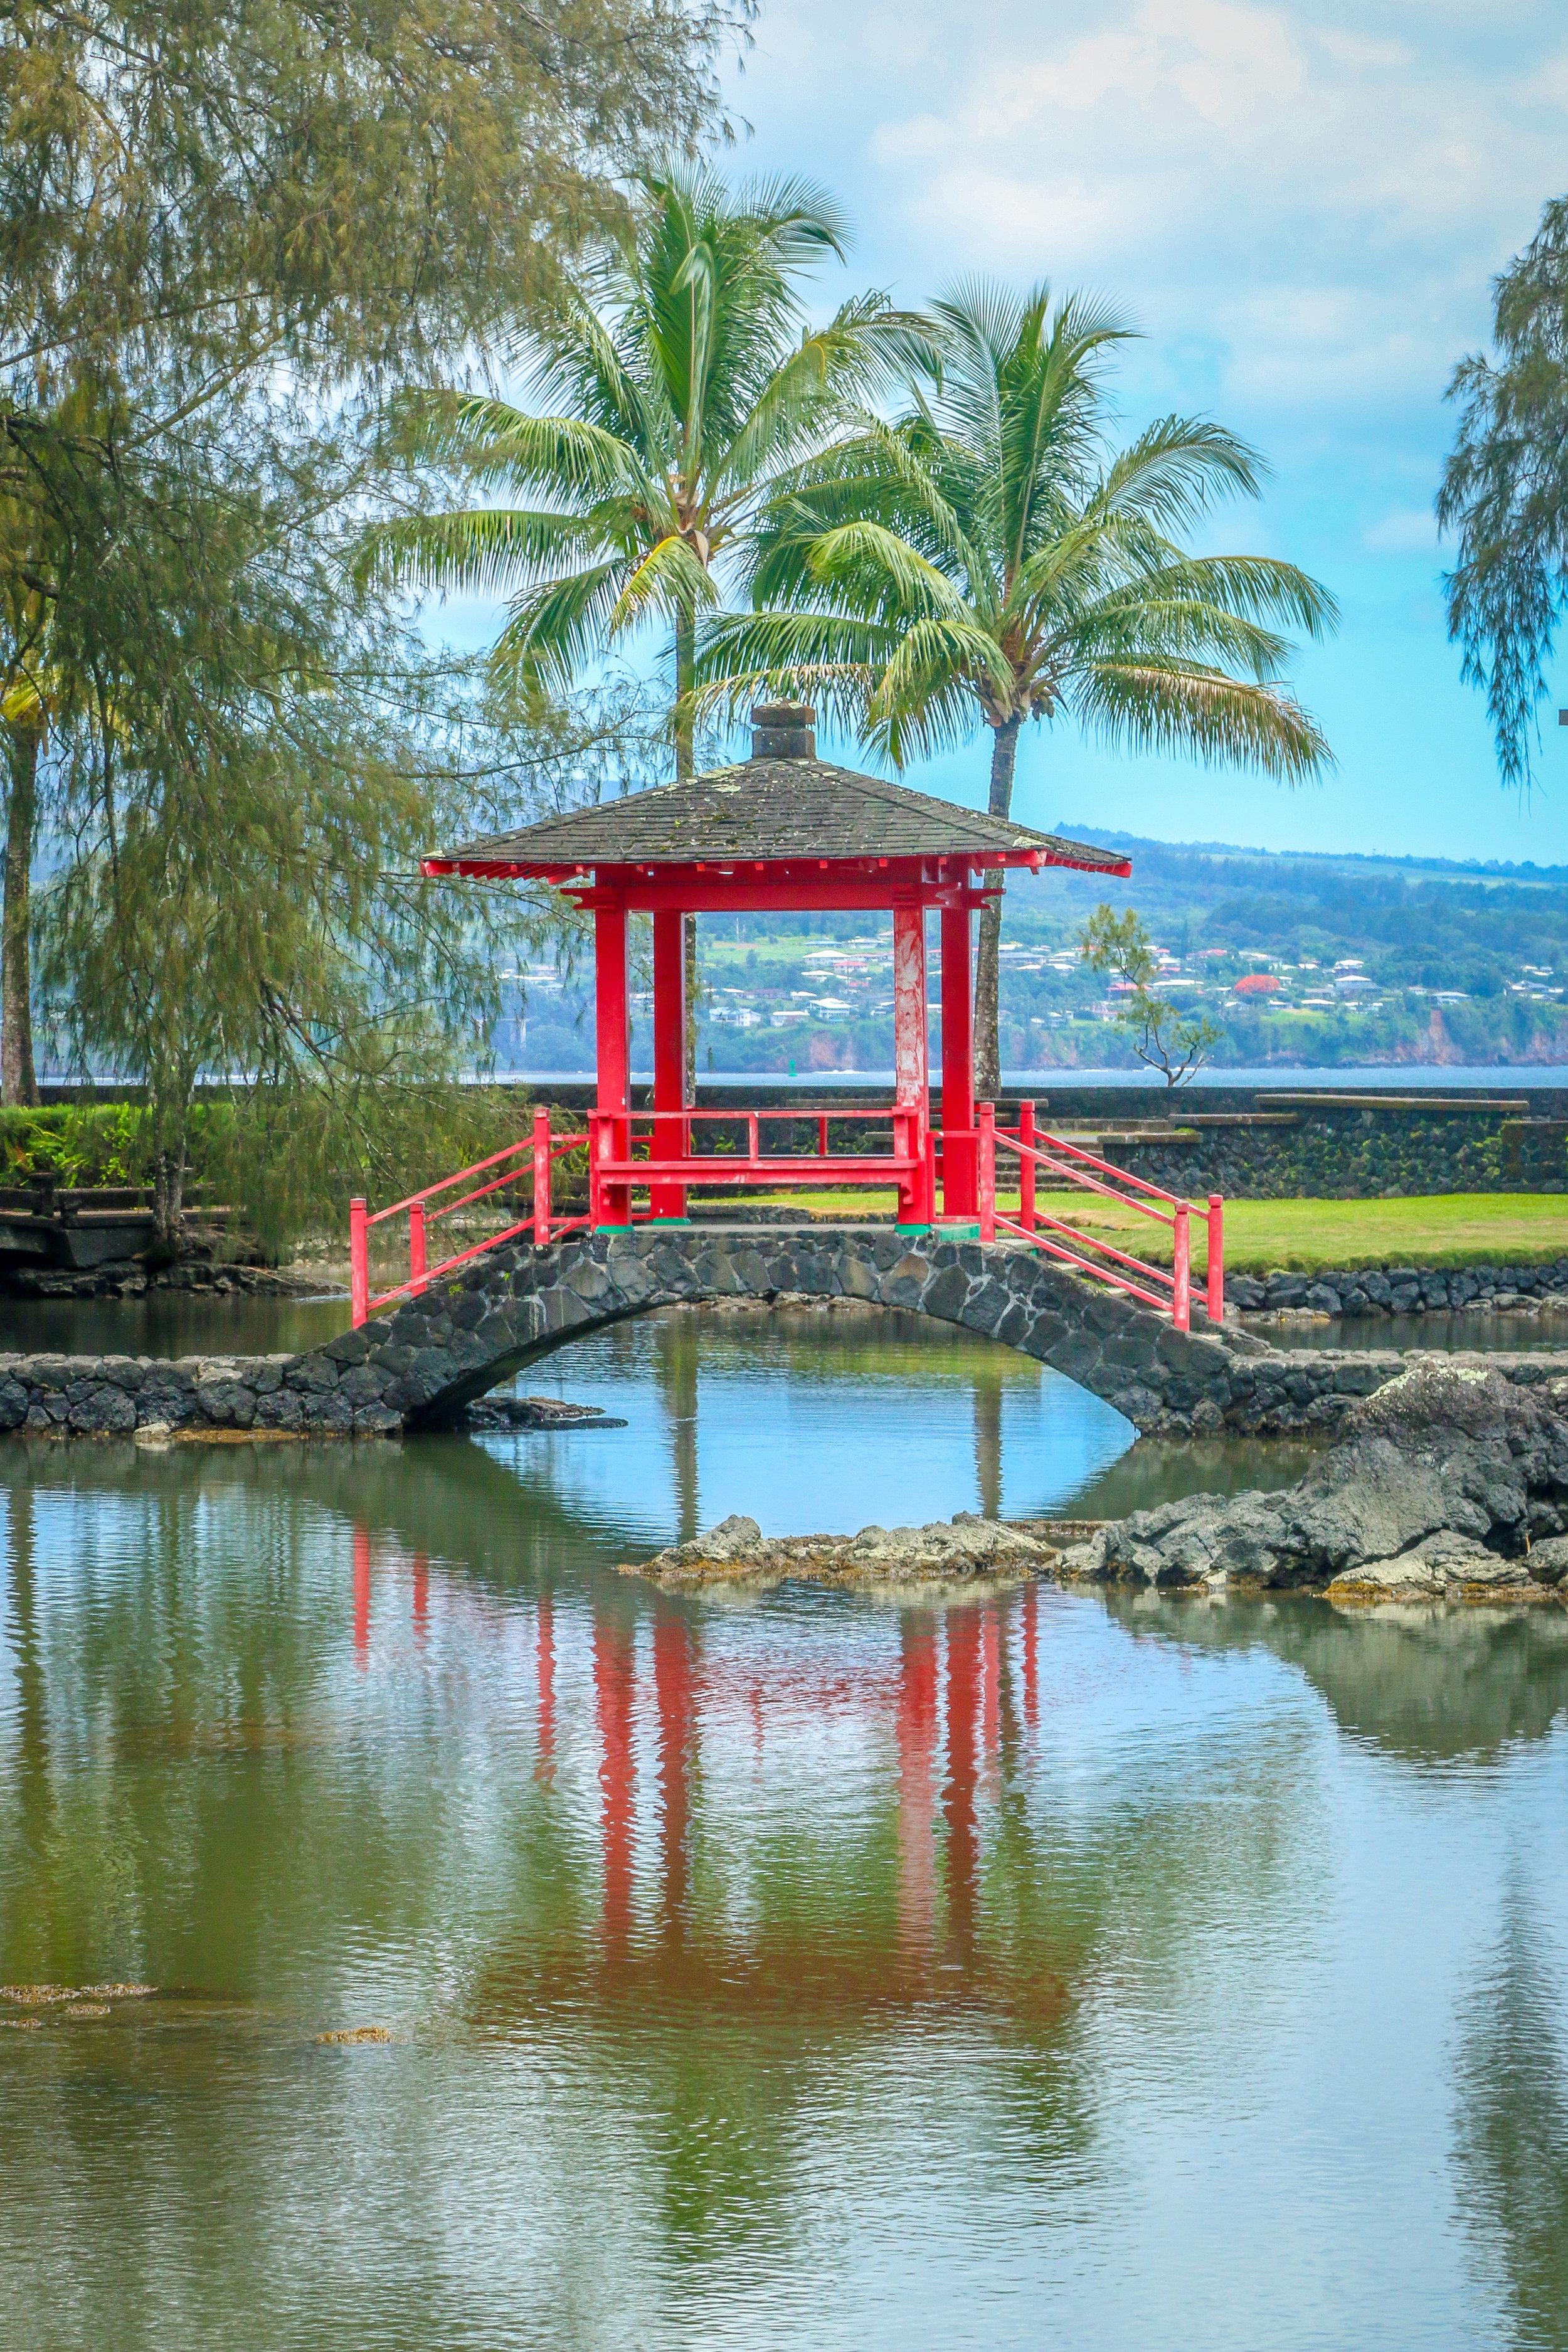 Hawaii HI Big Island Photos Photography Japanese Arch Hilo